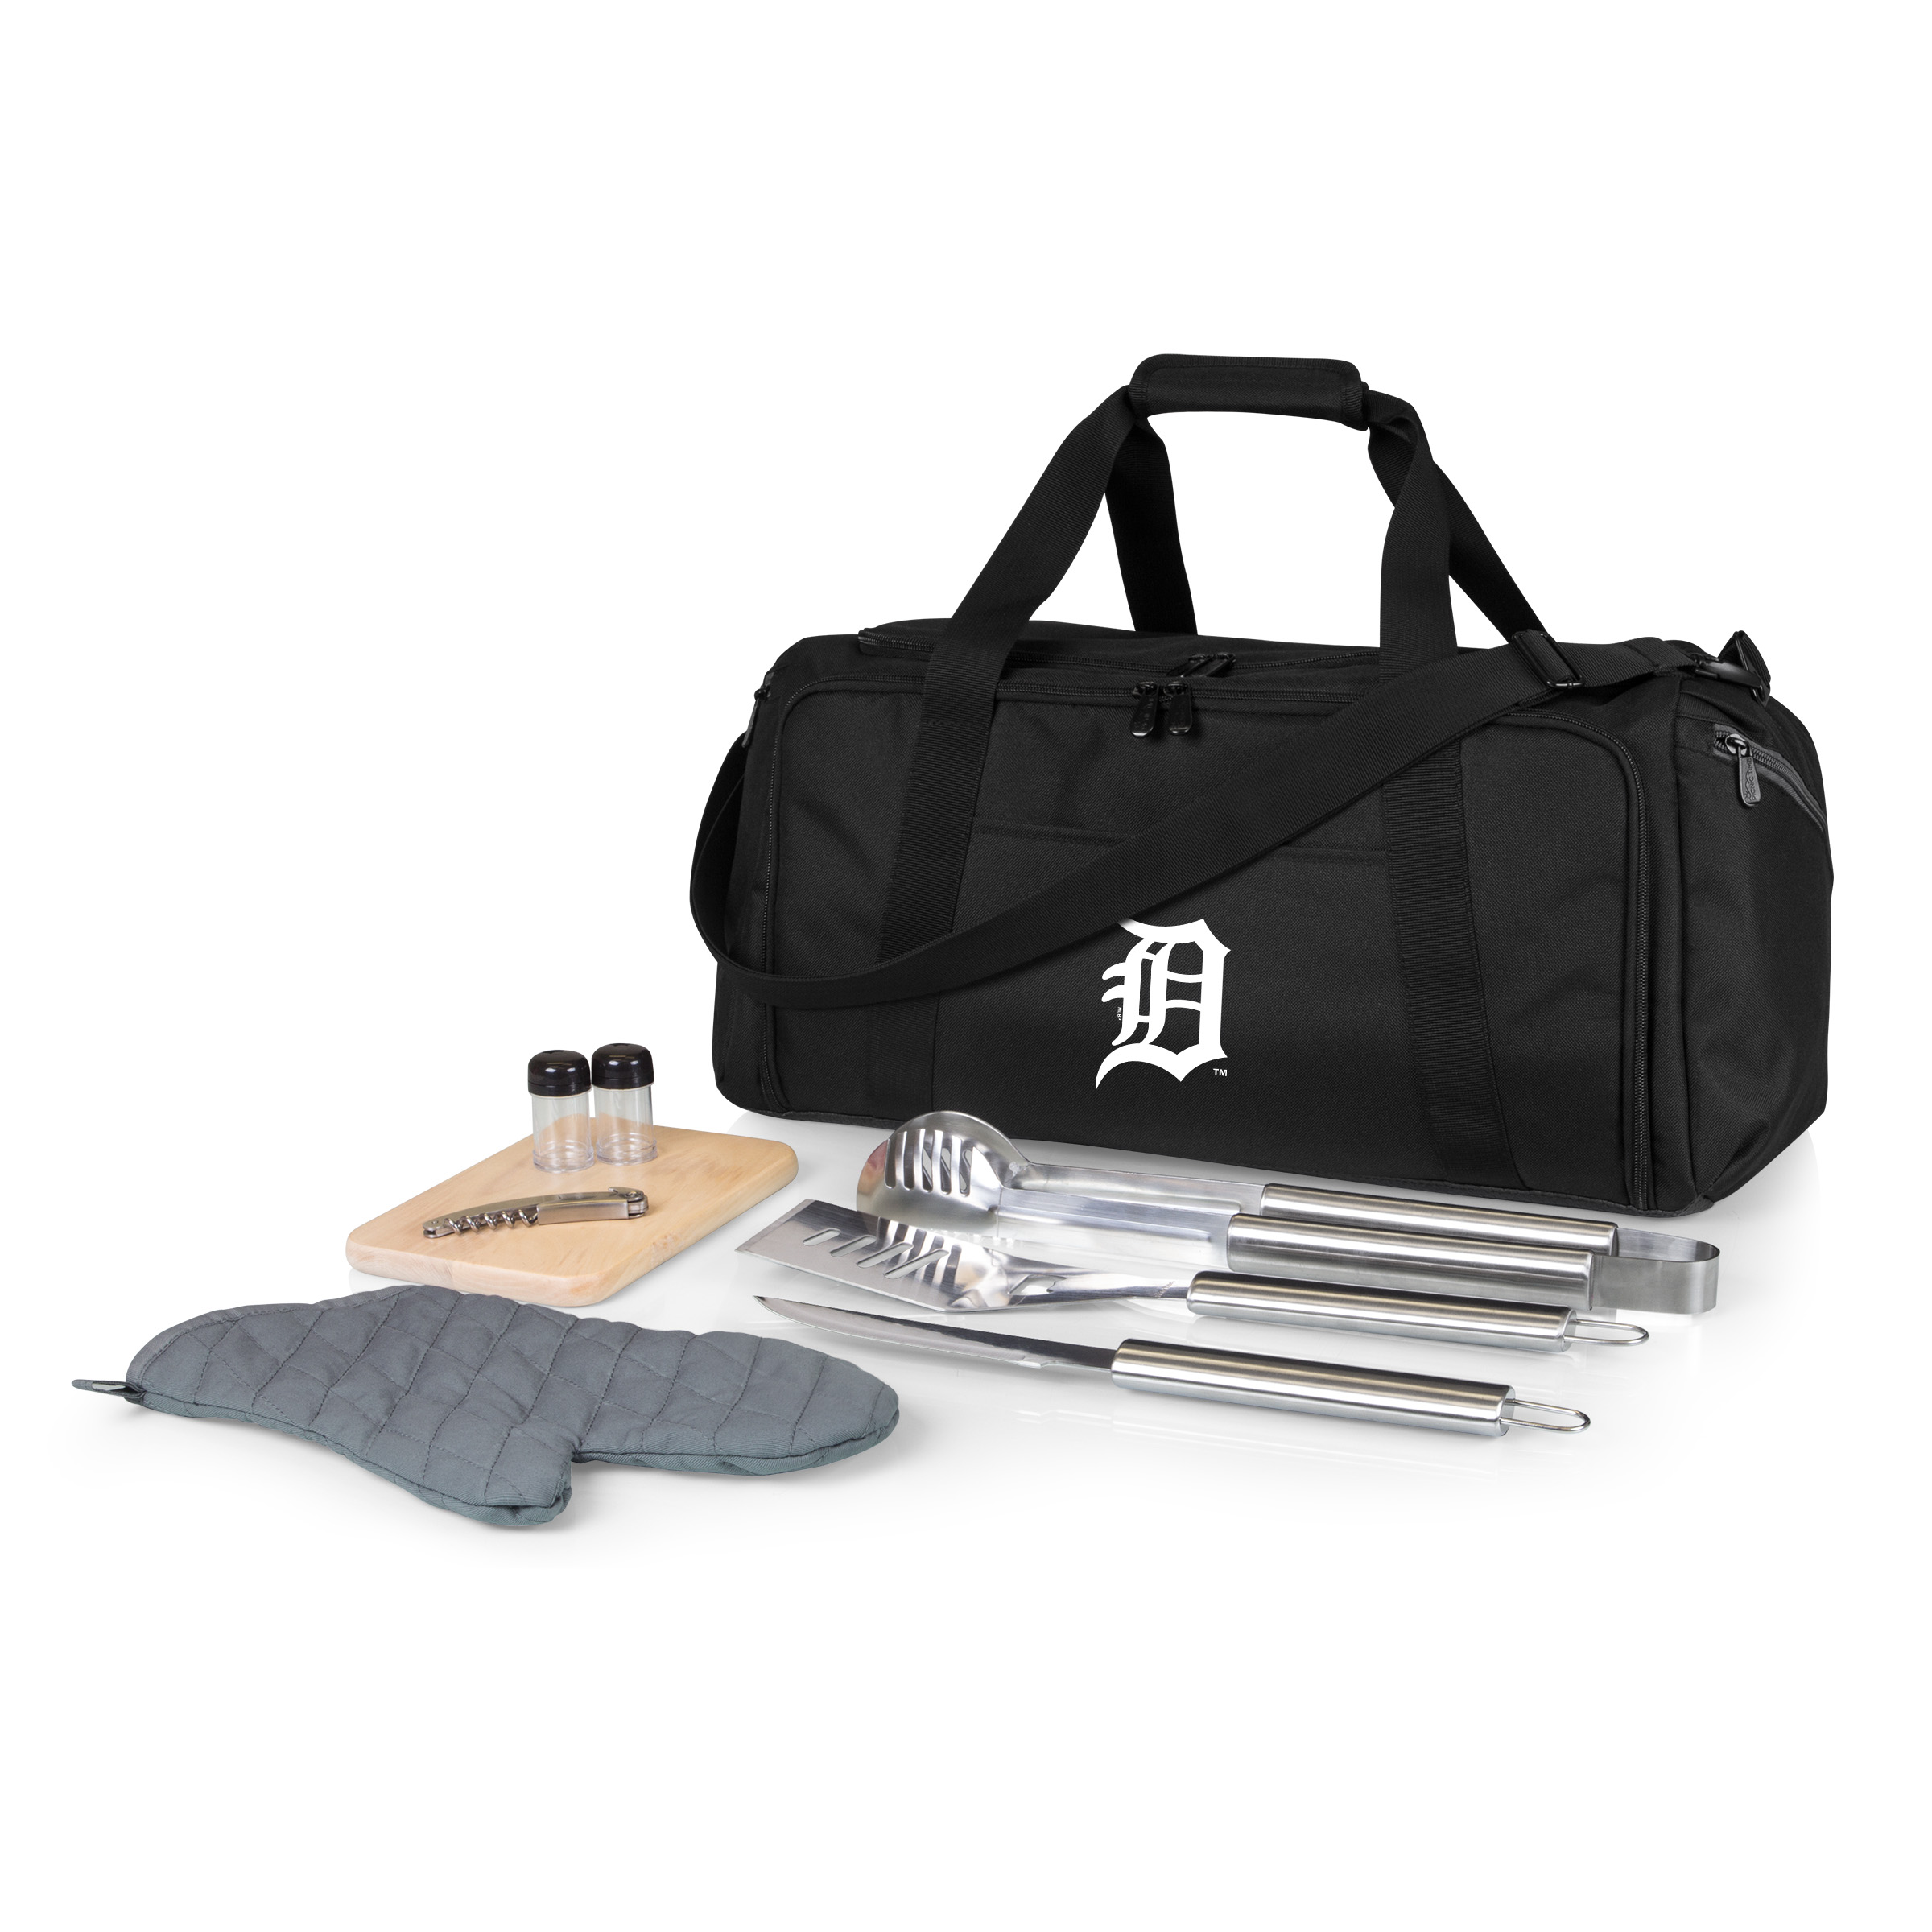 Detroit Tigers BBQ Kit Cooler - Black - No Size